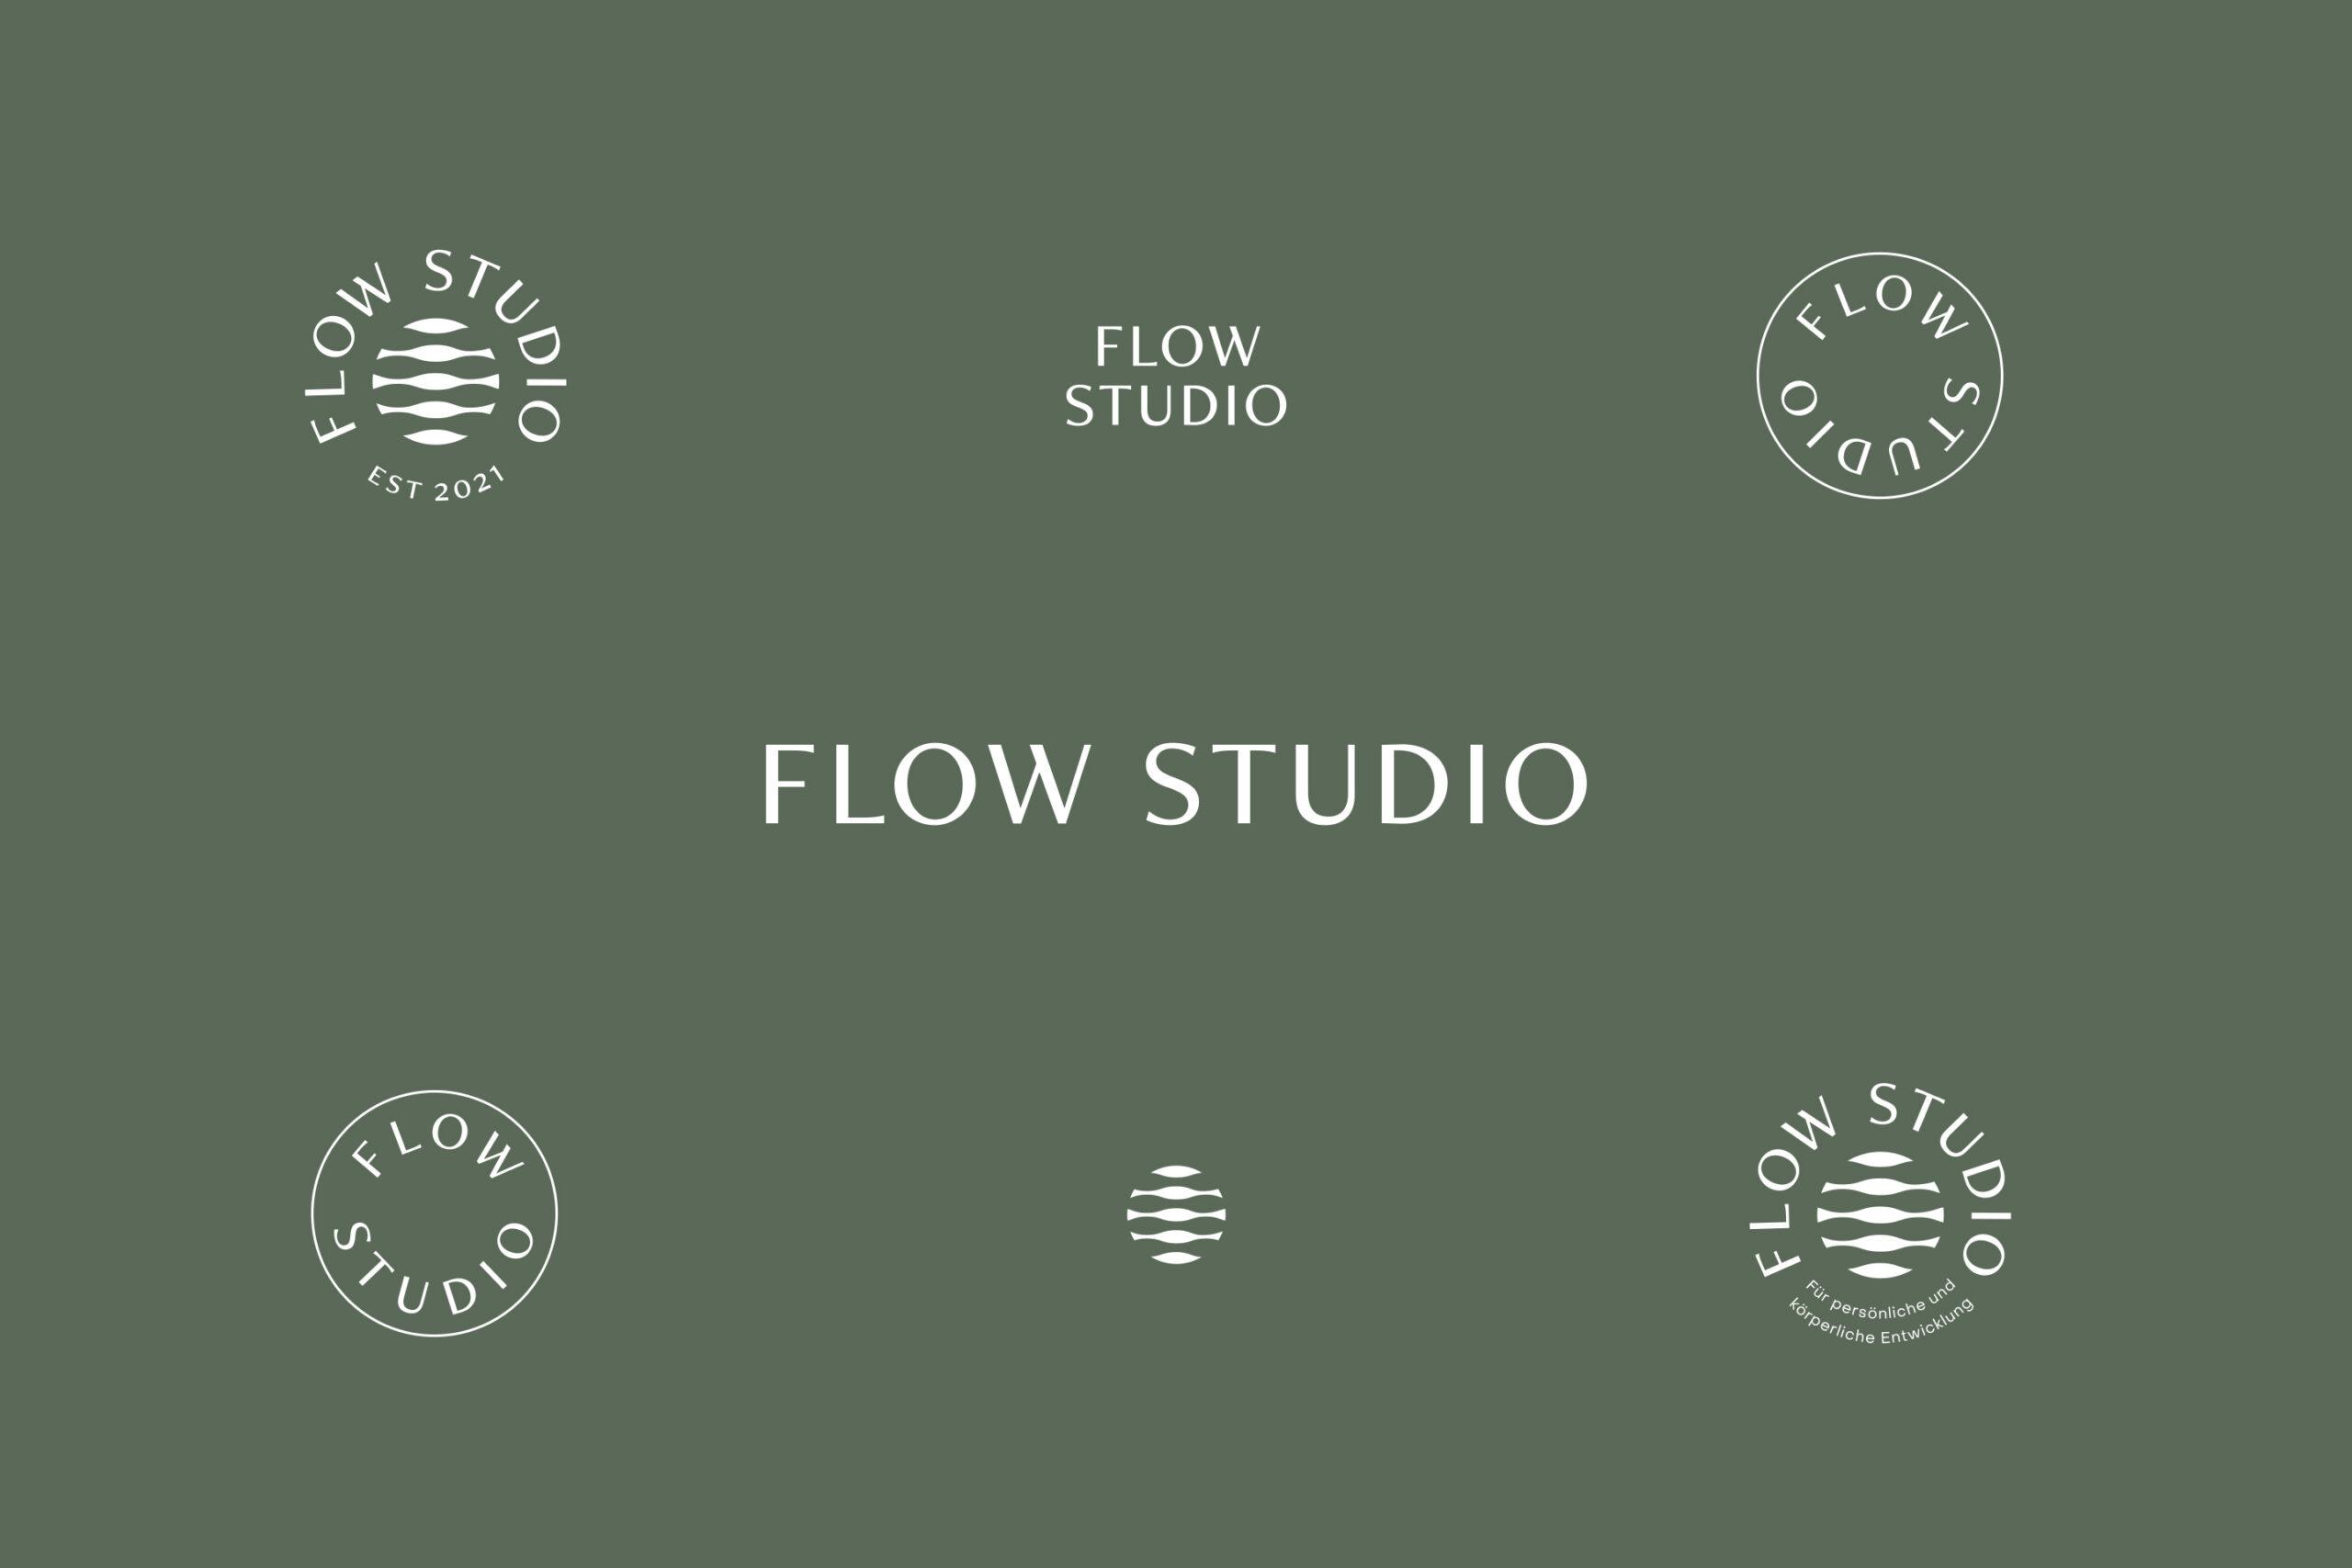 2021-05-13-flow-studio-logos-2880×1920-1